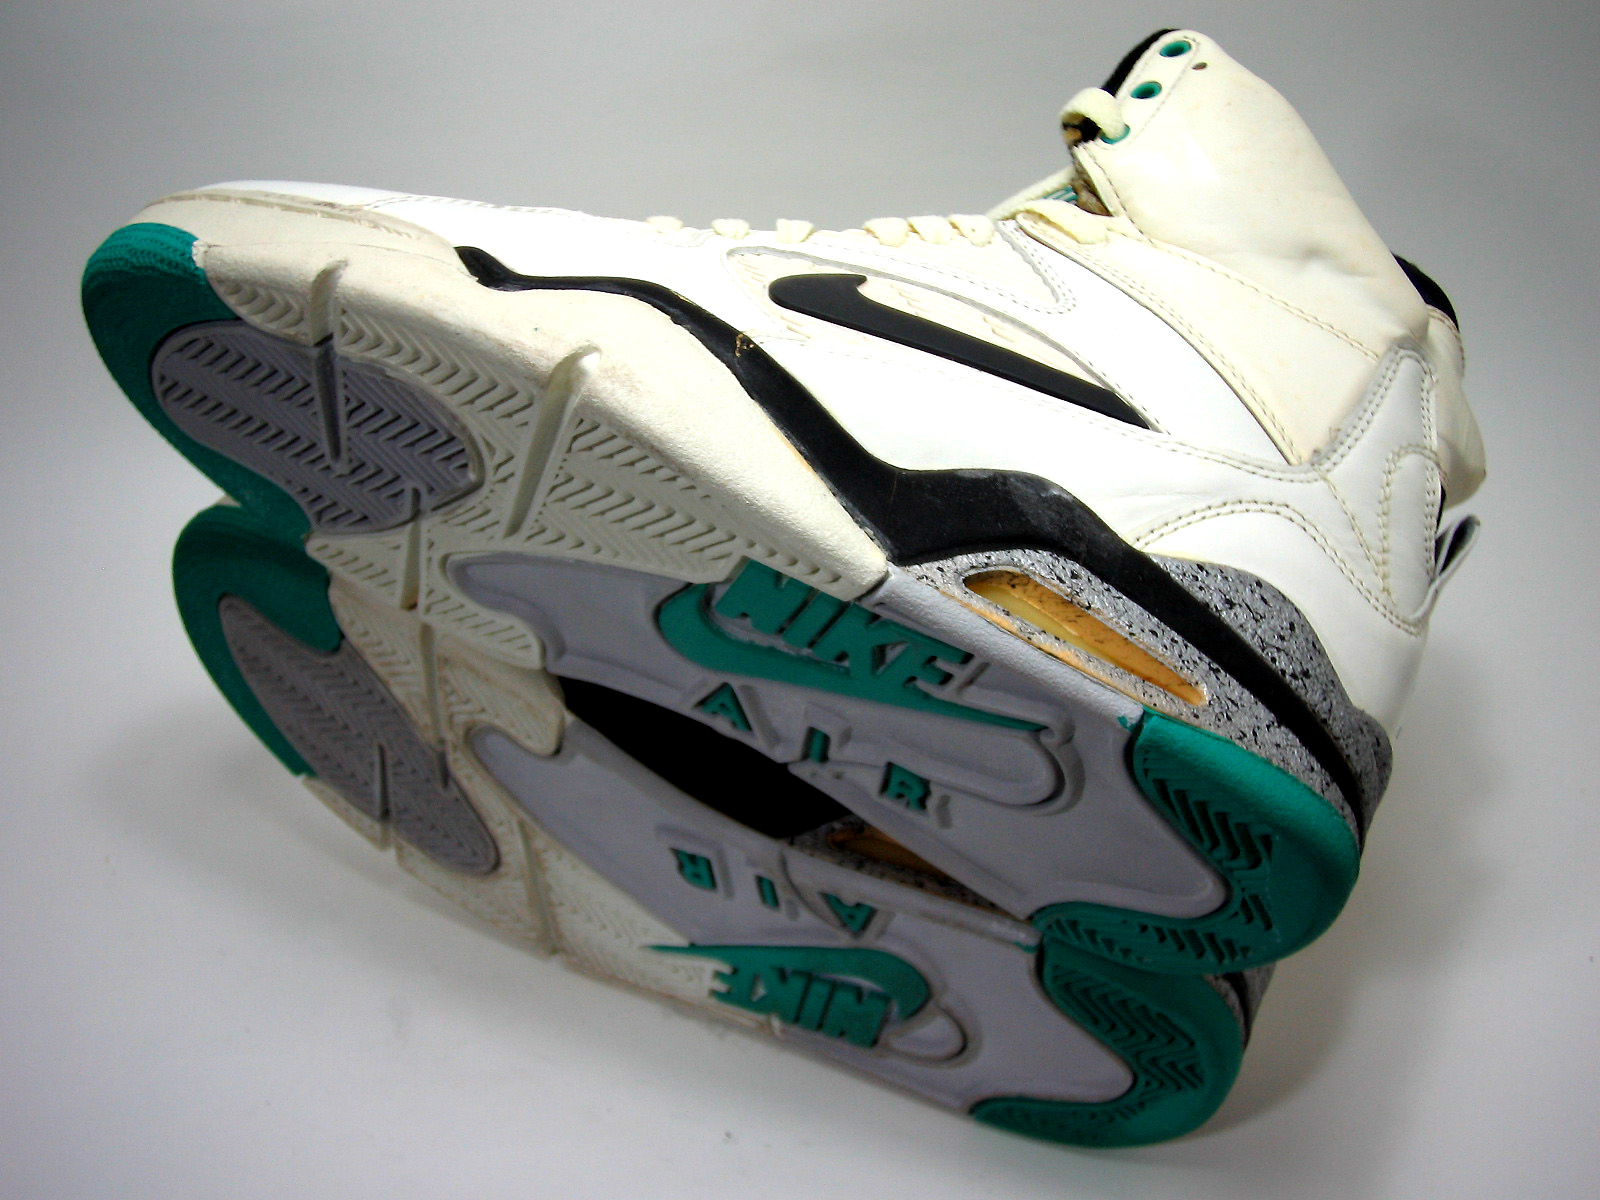 Nike Air Command Force (1990)